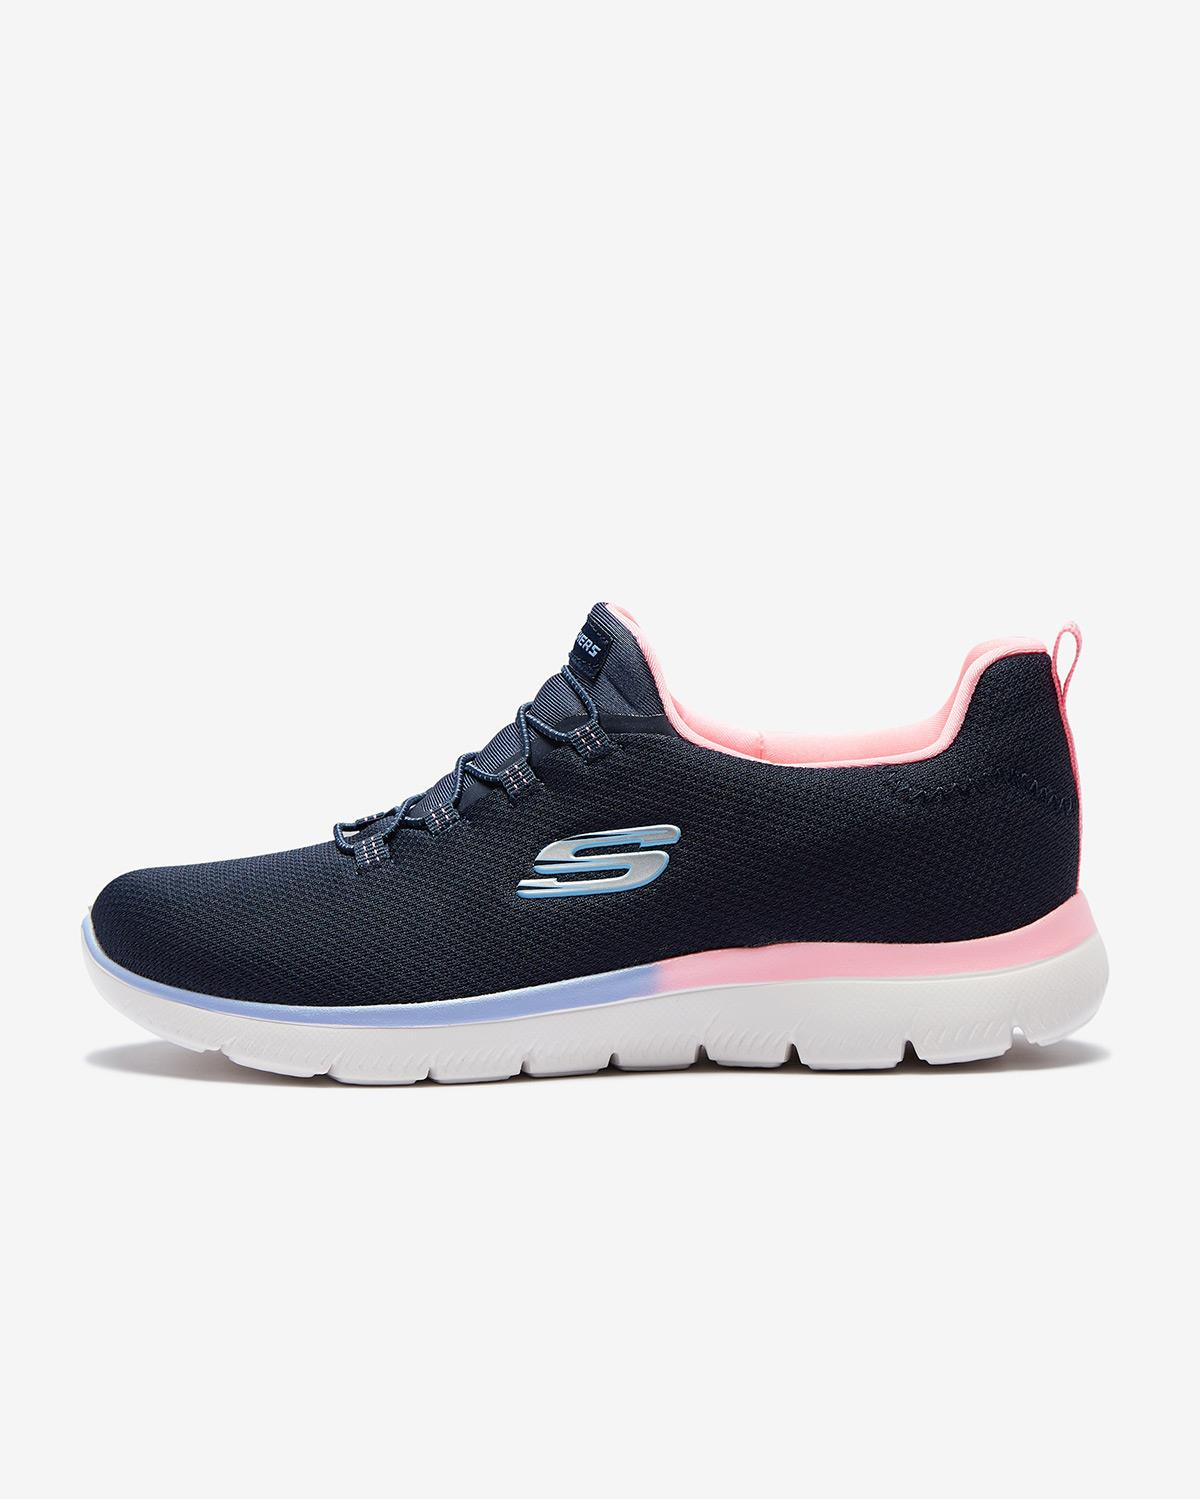 Skechers SUMMITS - GLOWING GLITZ Kadın Ayakkabısı